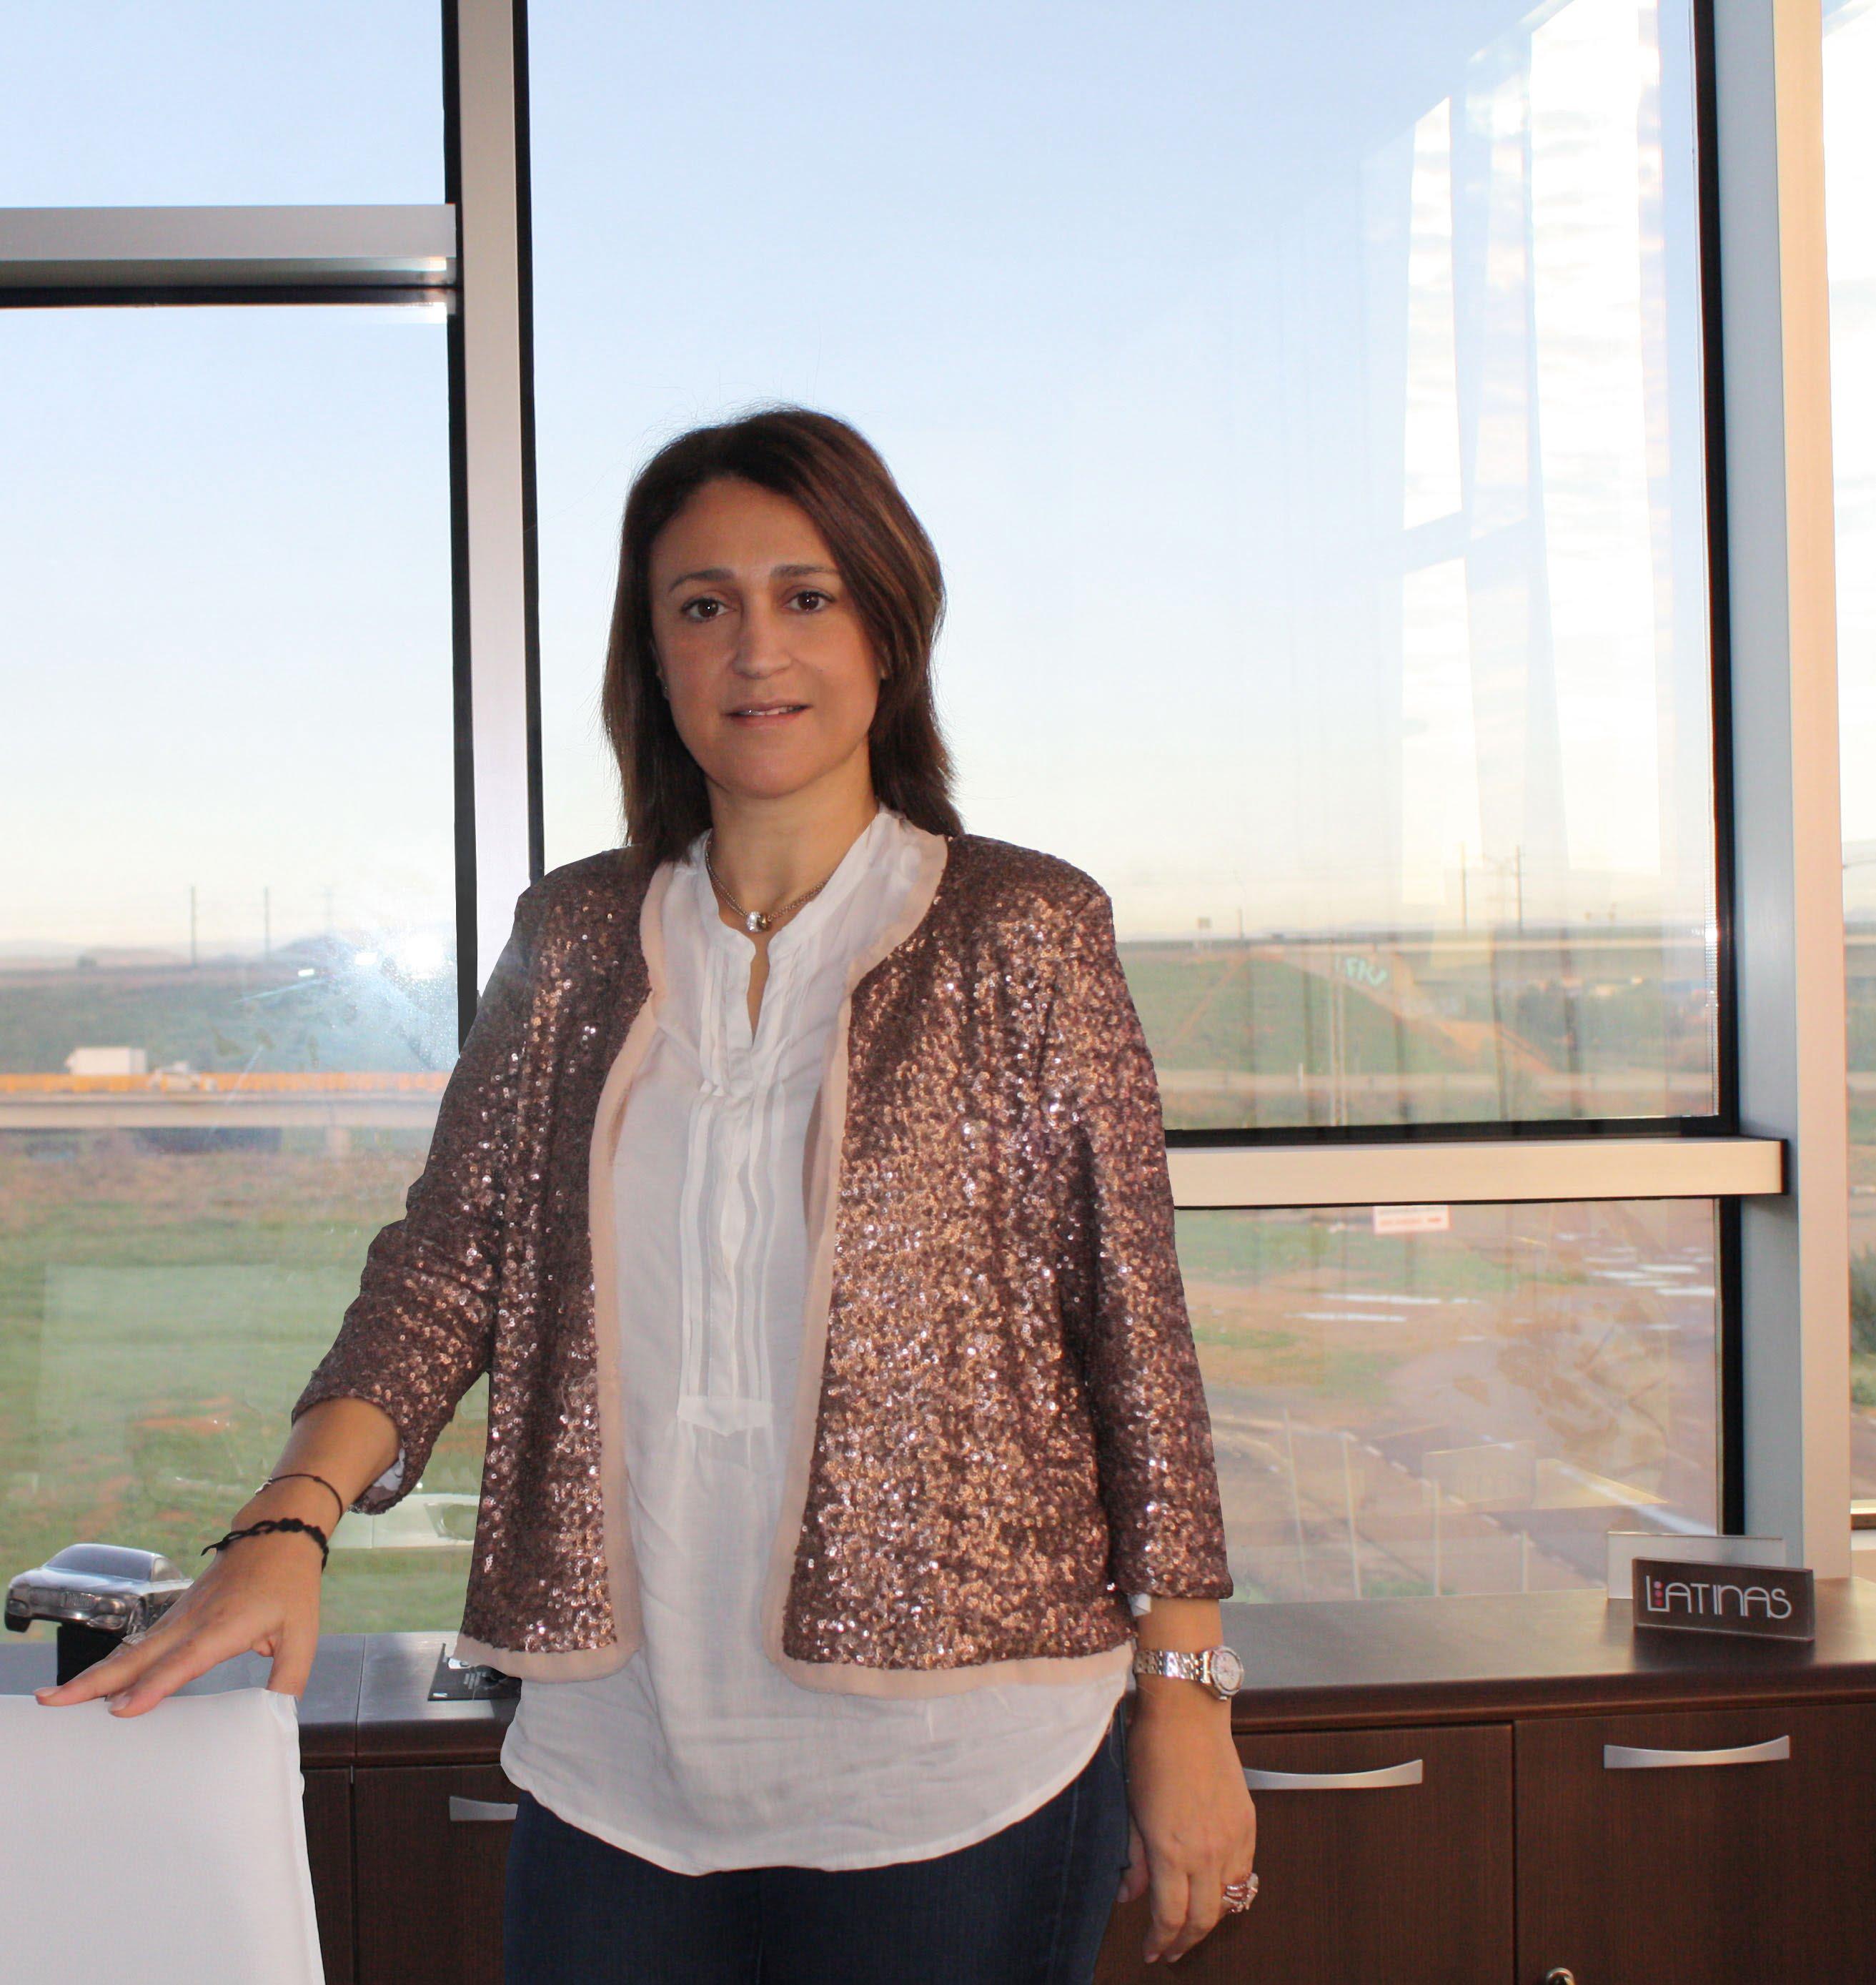 Sra. Inmaculada Muñoz Gozalvo